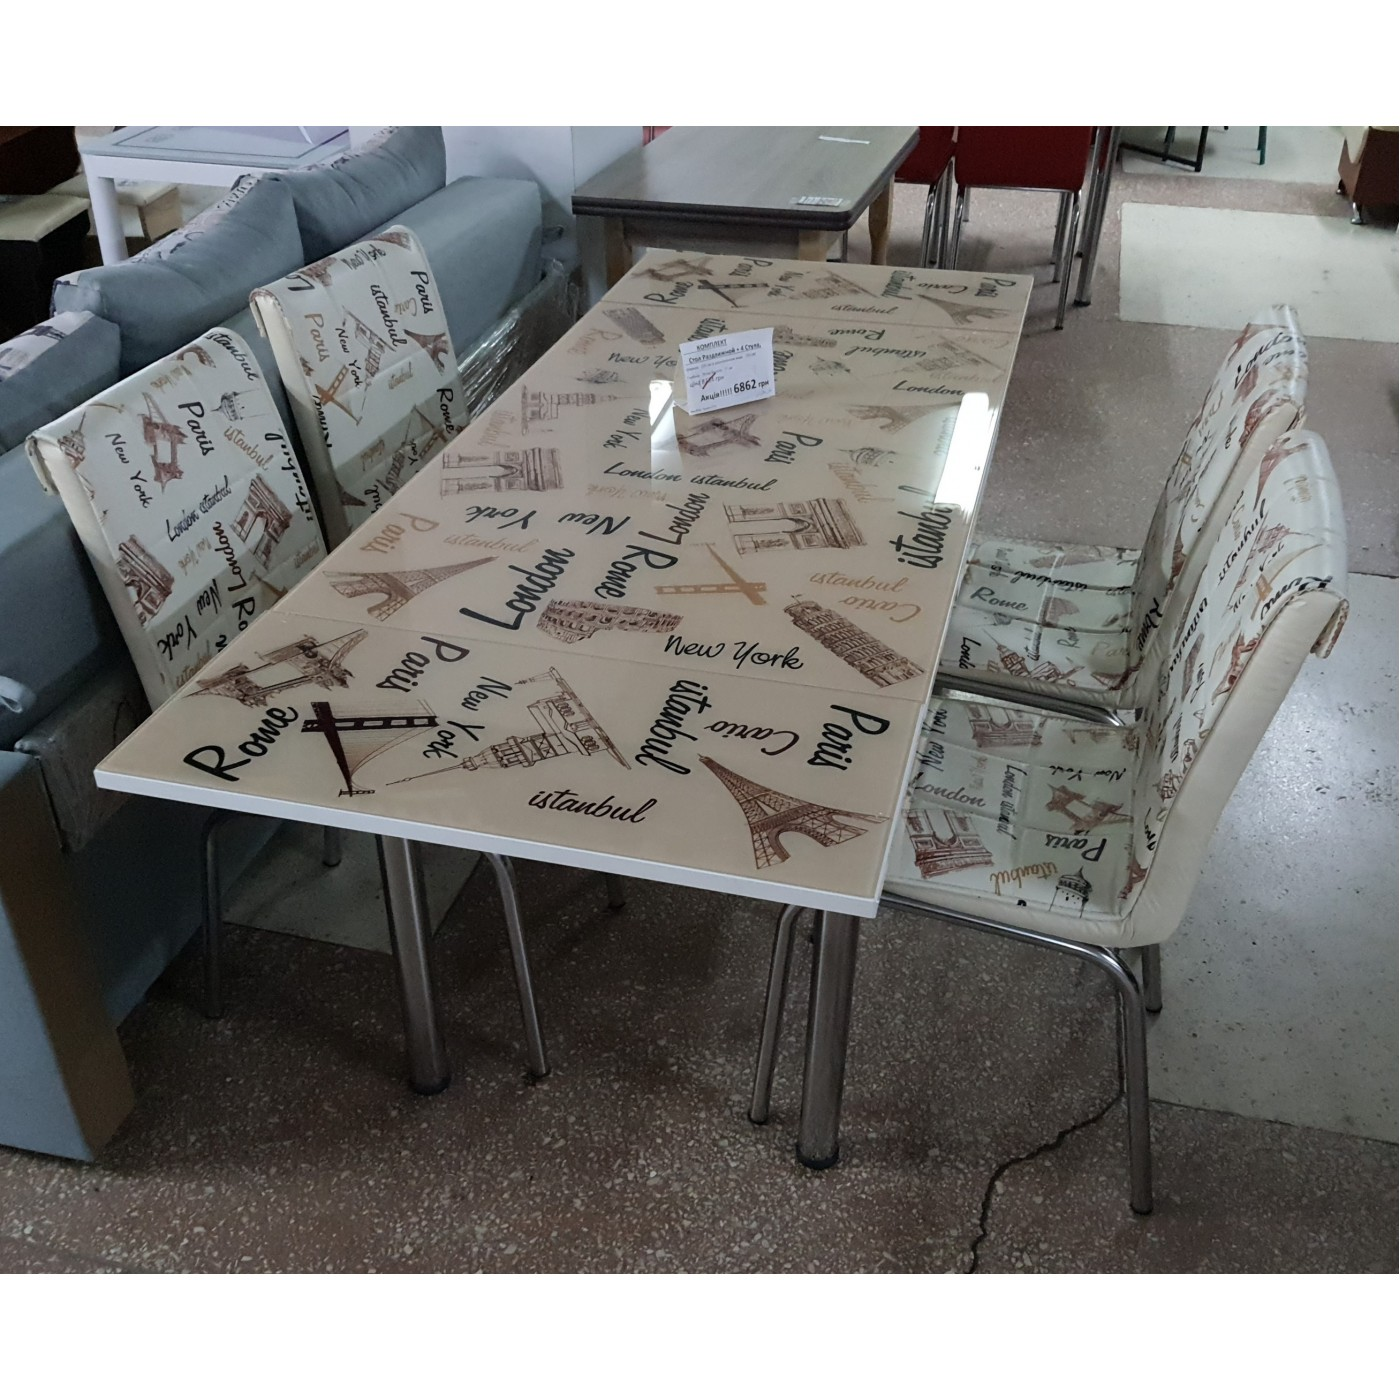 Стол стекло/хром/дсп + 4 стула Париж коричн.110*70 см до 170*70